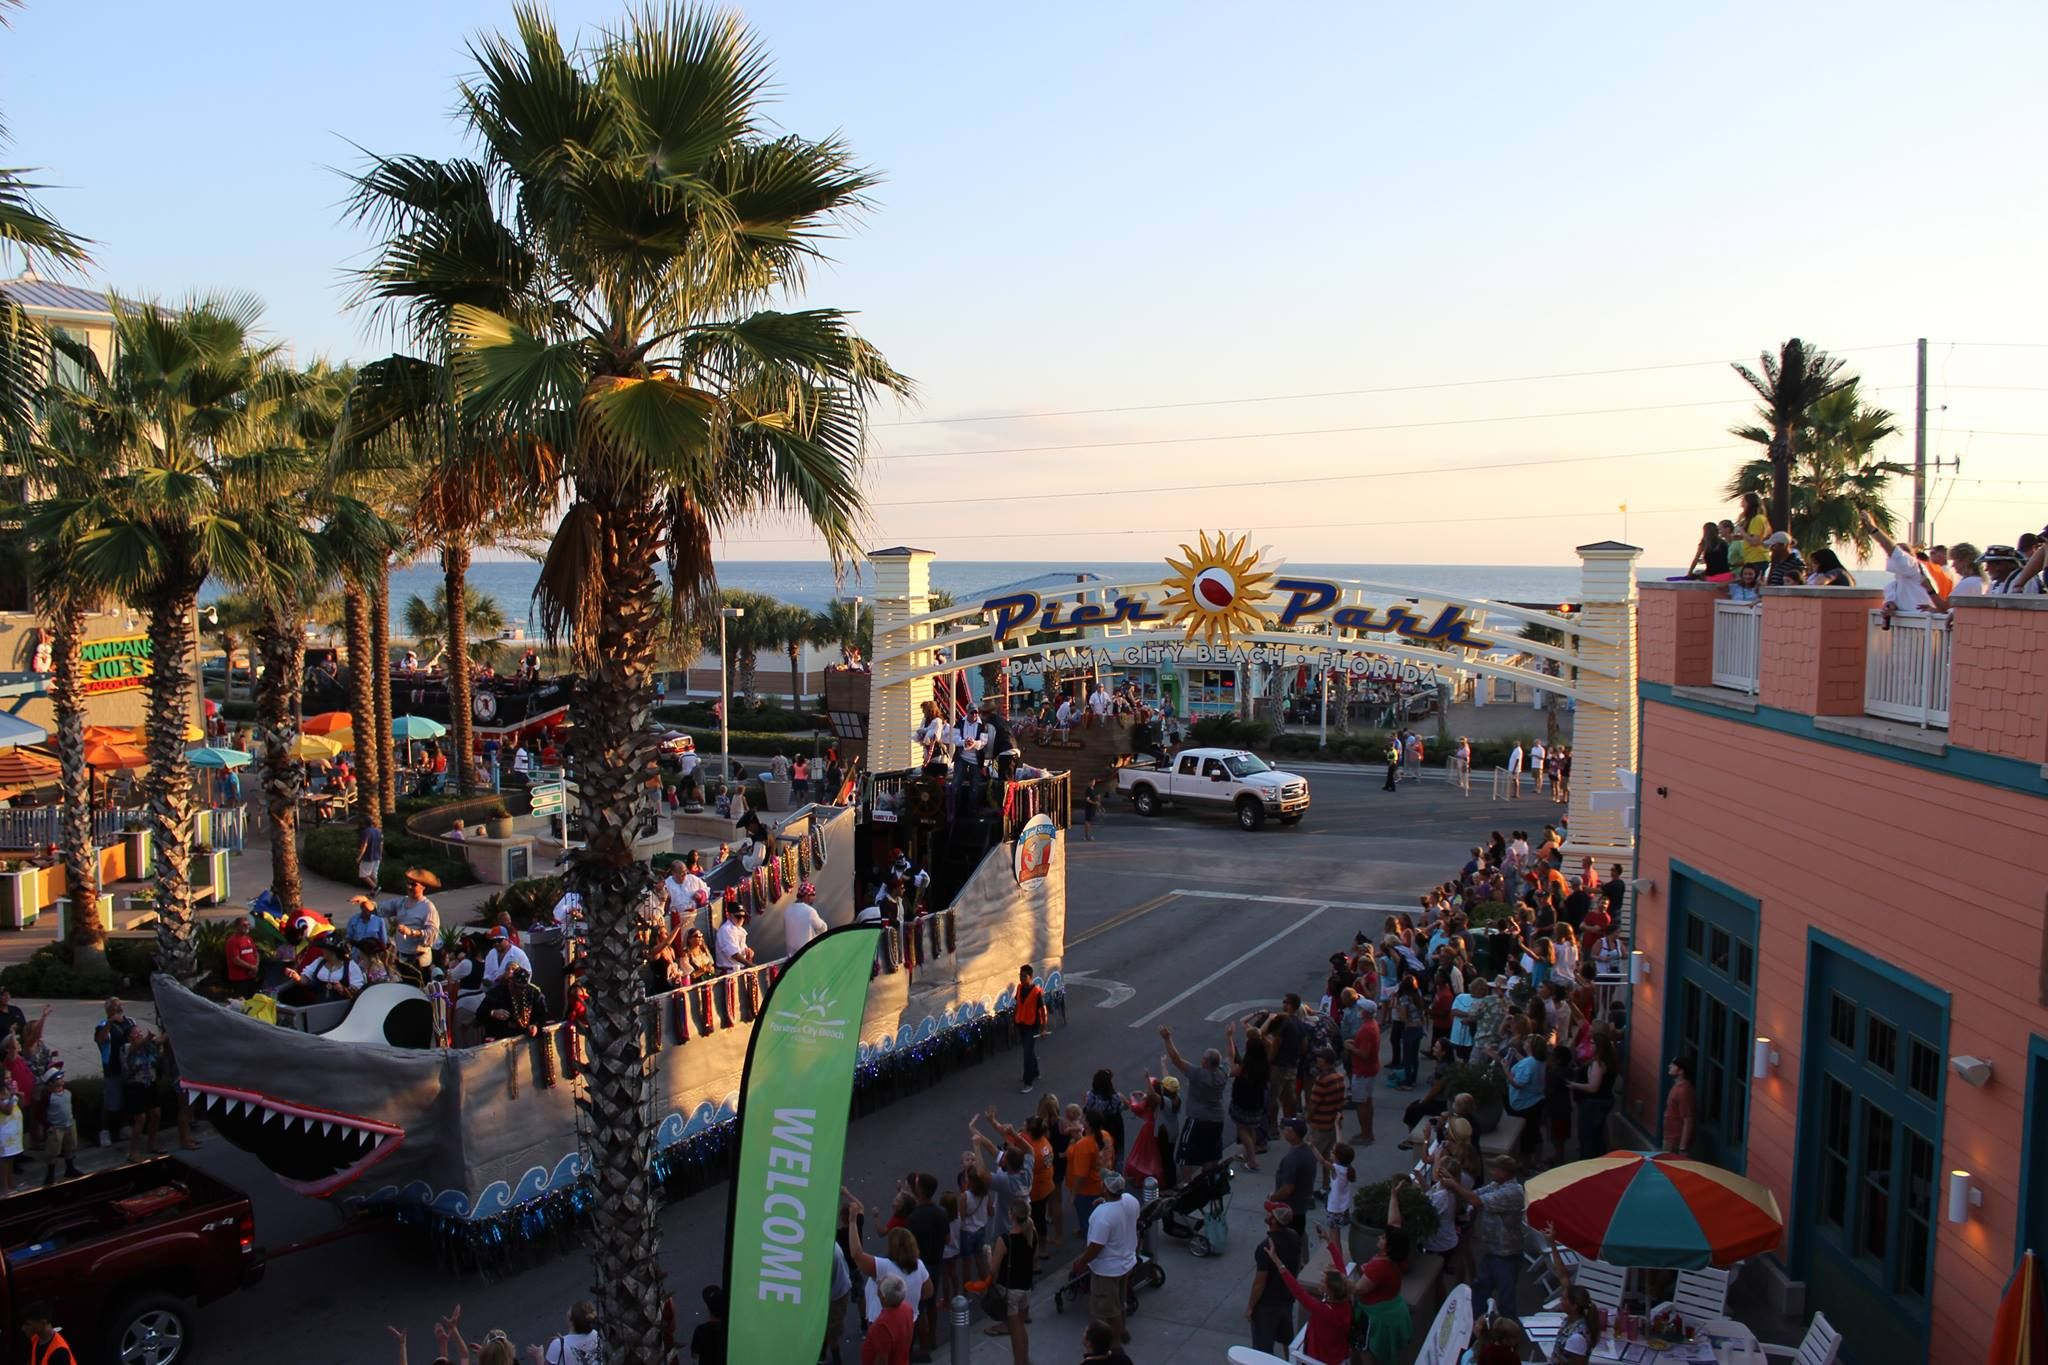 Mardi Gras in Panama City Beach.. Check it out Feb. 9th